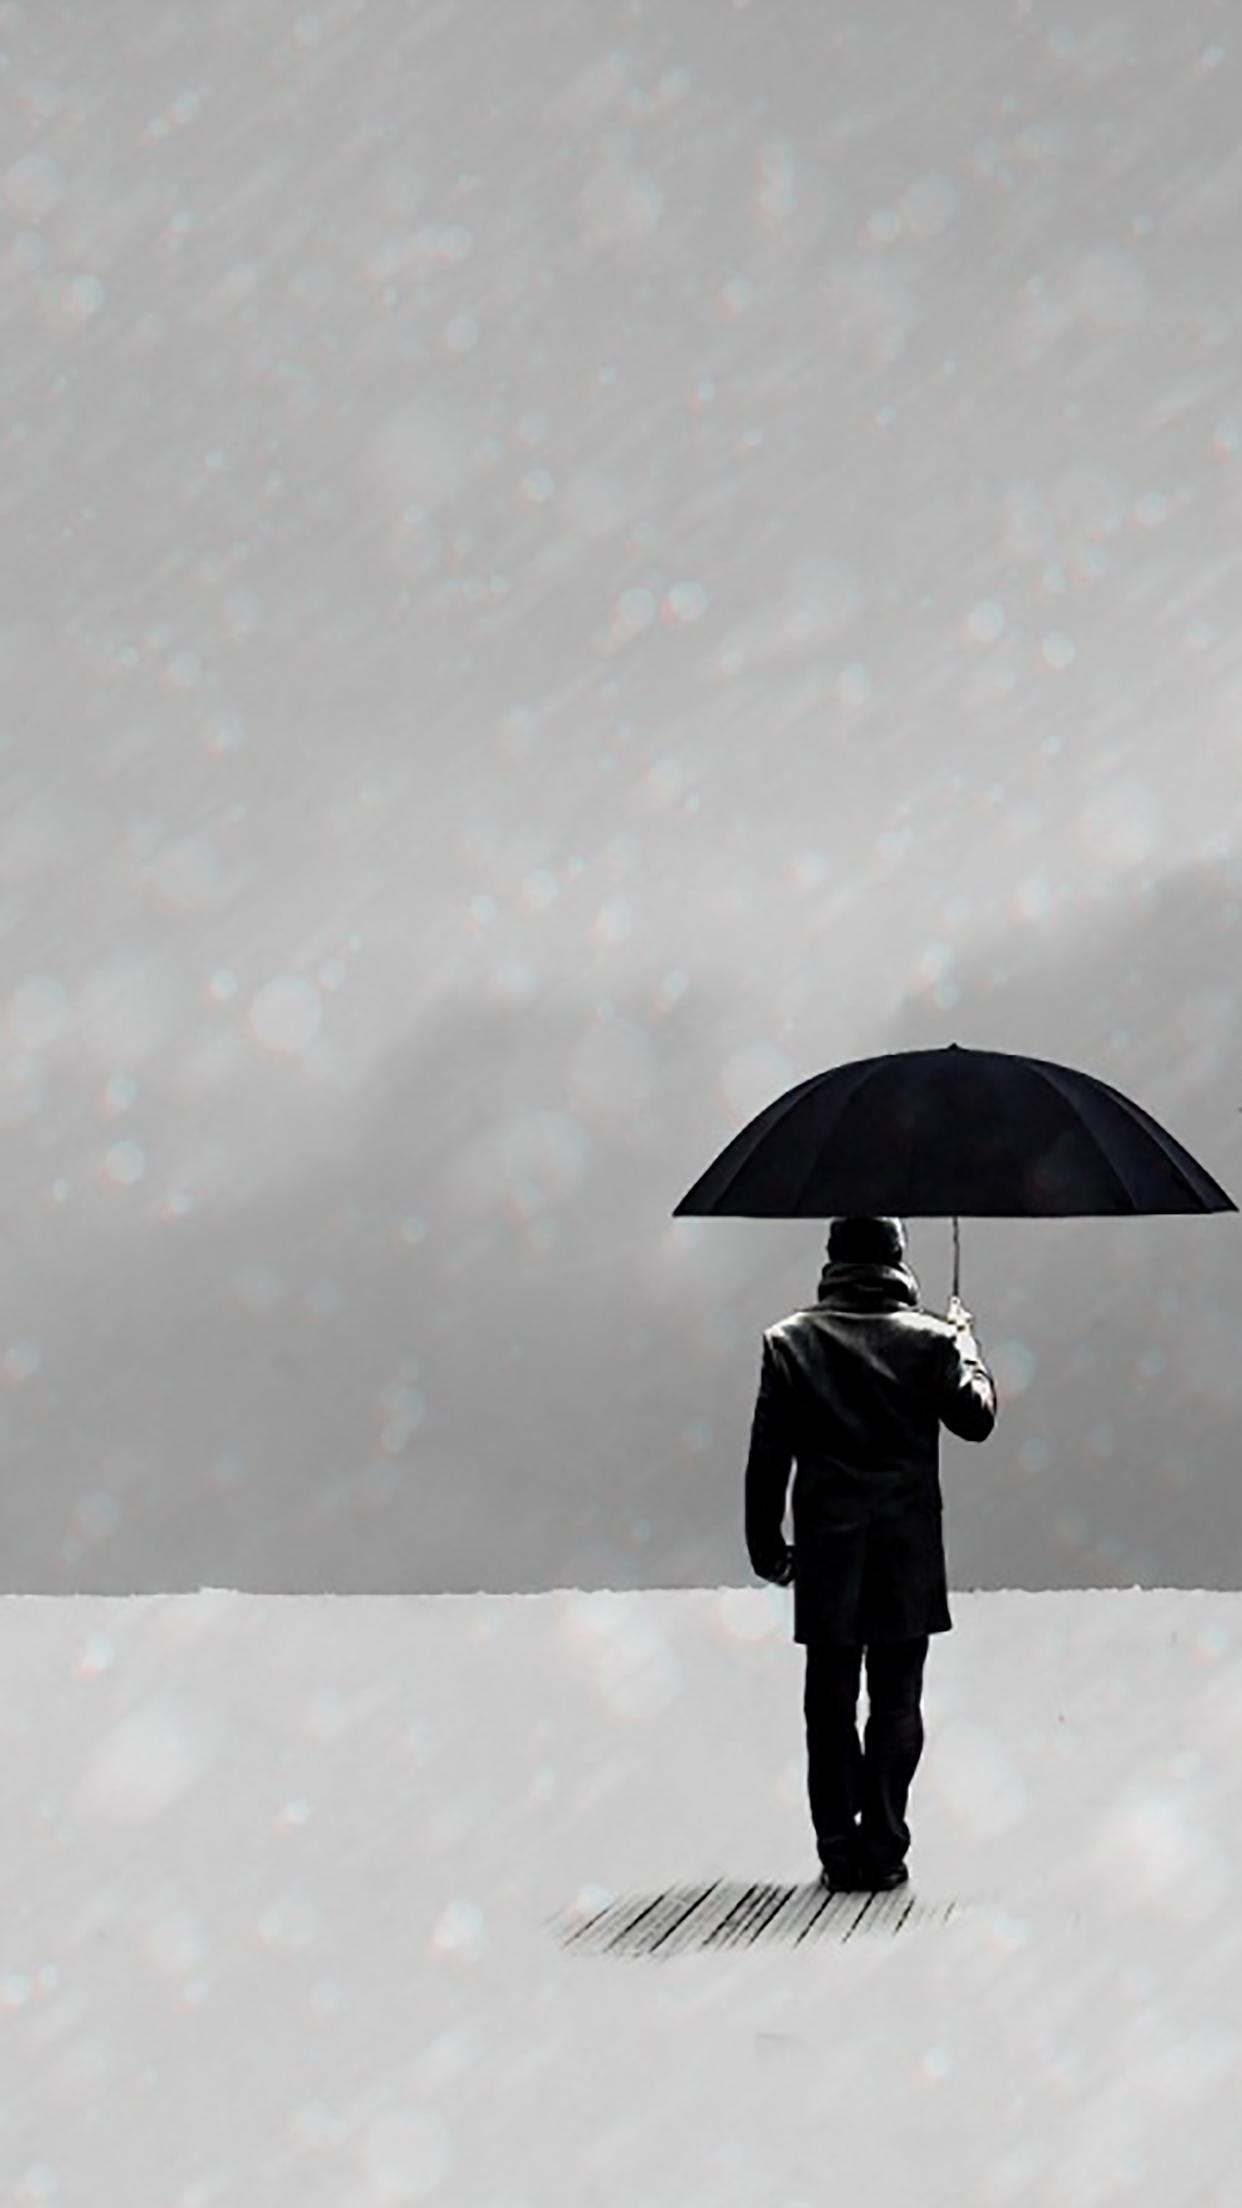 Umbrella Man Standing 3Wallpapers iPhone Parallax Les 3Wallpapers iPhone du jour (13/01/2017)